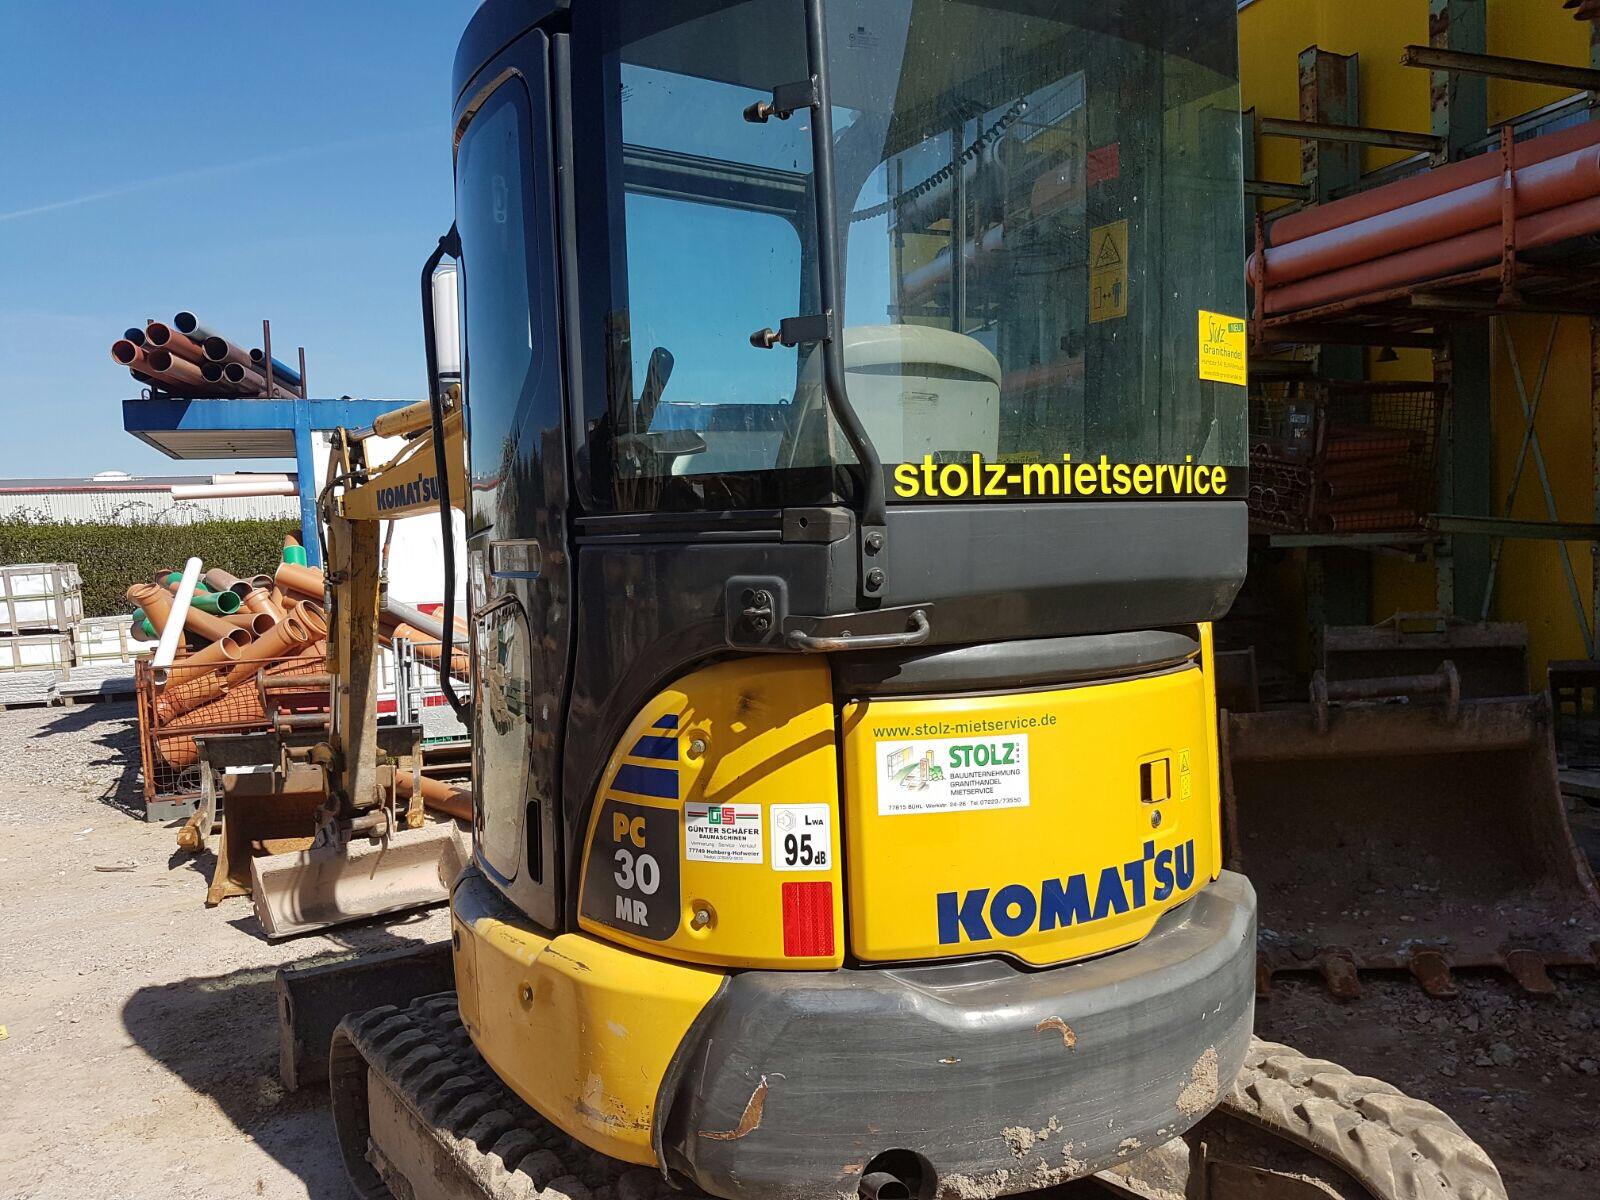 Komatsu Minibagger Stolz GmbH Bauunternehmung - Mietservice in Bühl/Baden